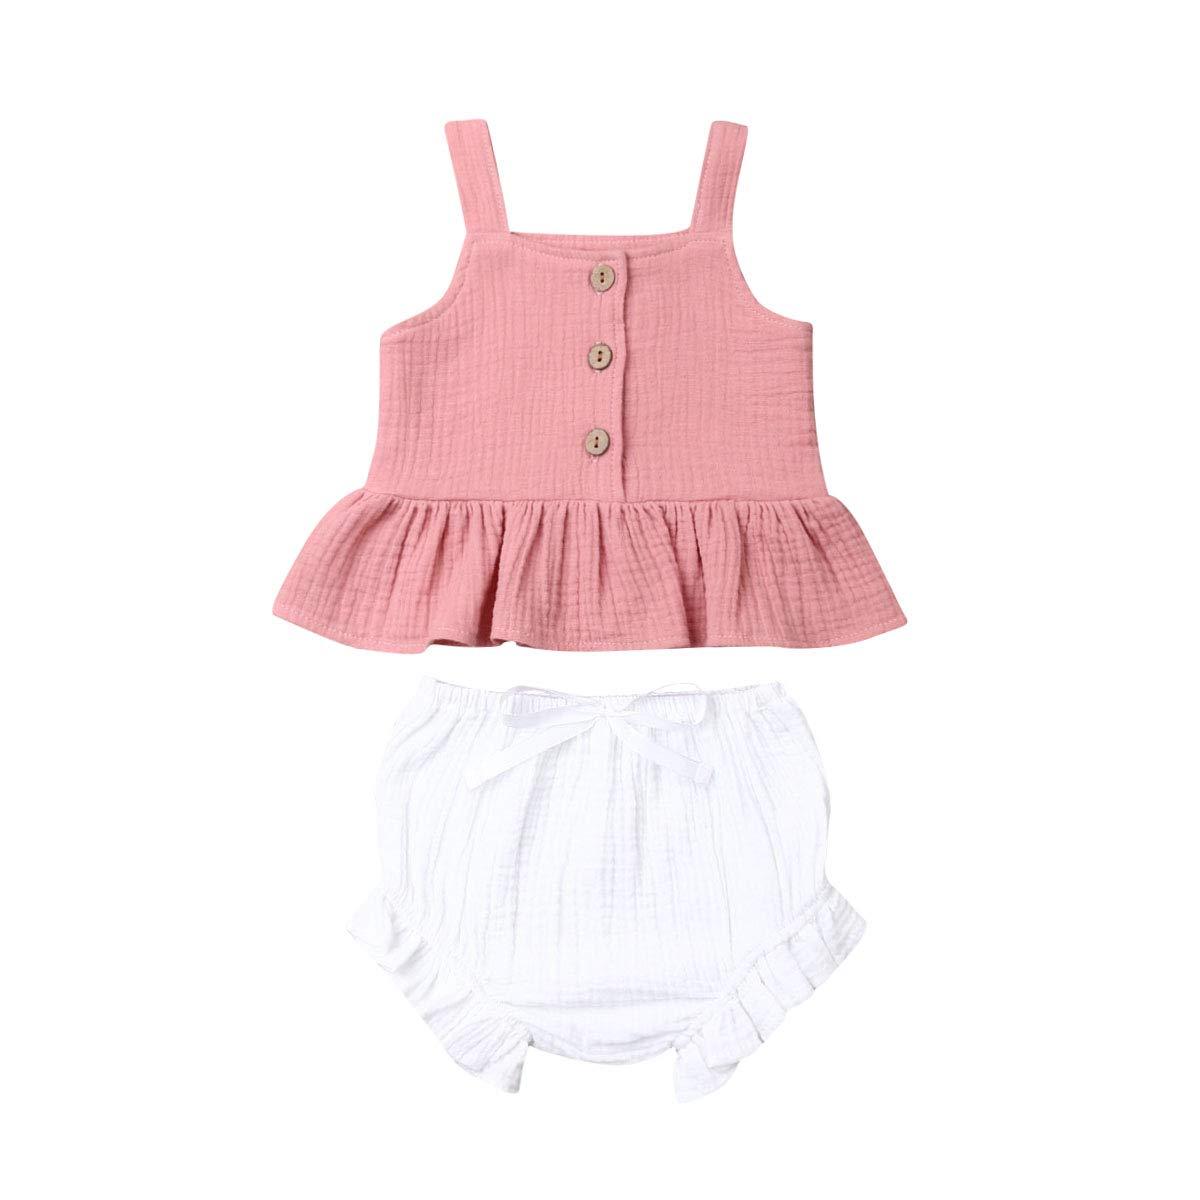 Toddler Kids Baby Girl Cotton Ruffle Halter Tank Top+ Bowknot Shorts Outfits 2PCS Set